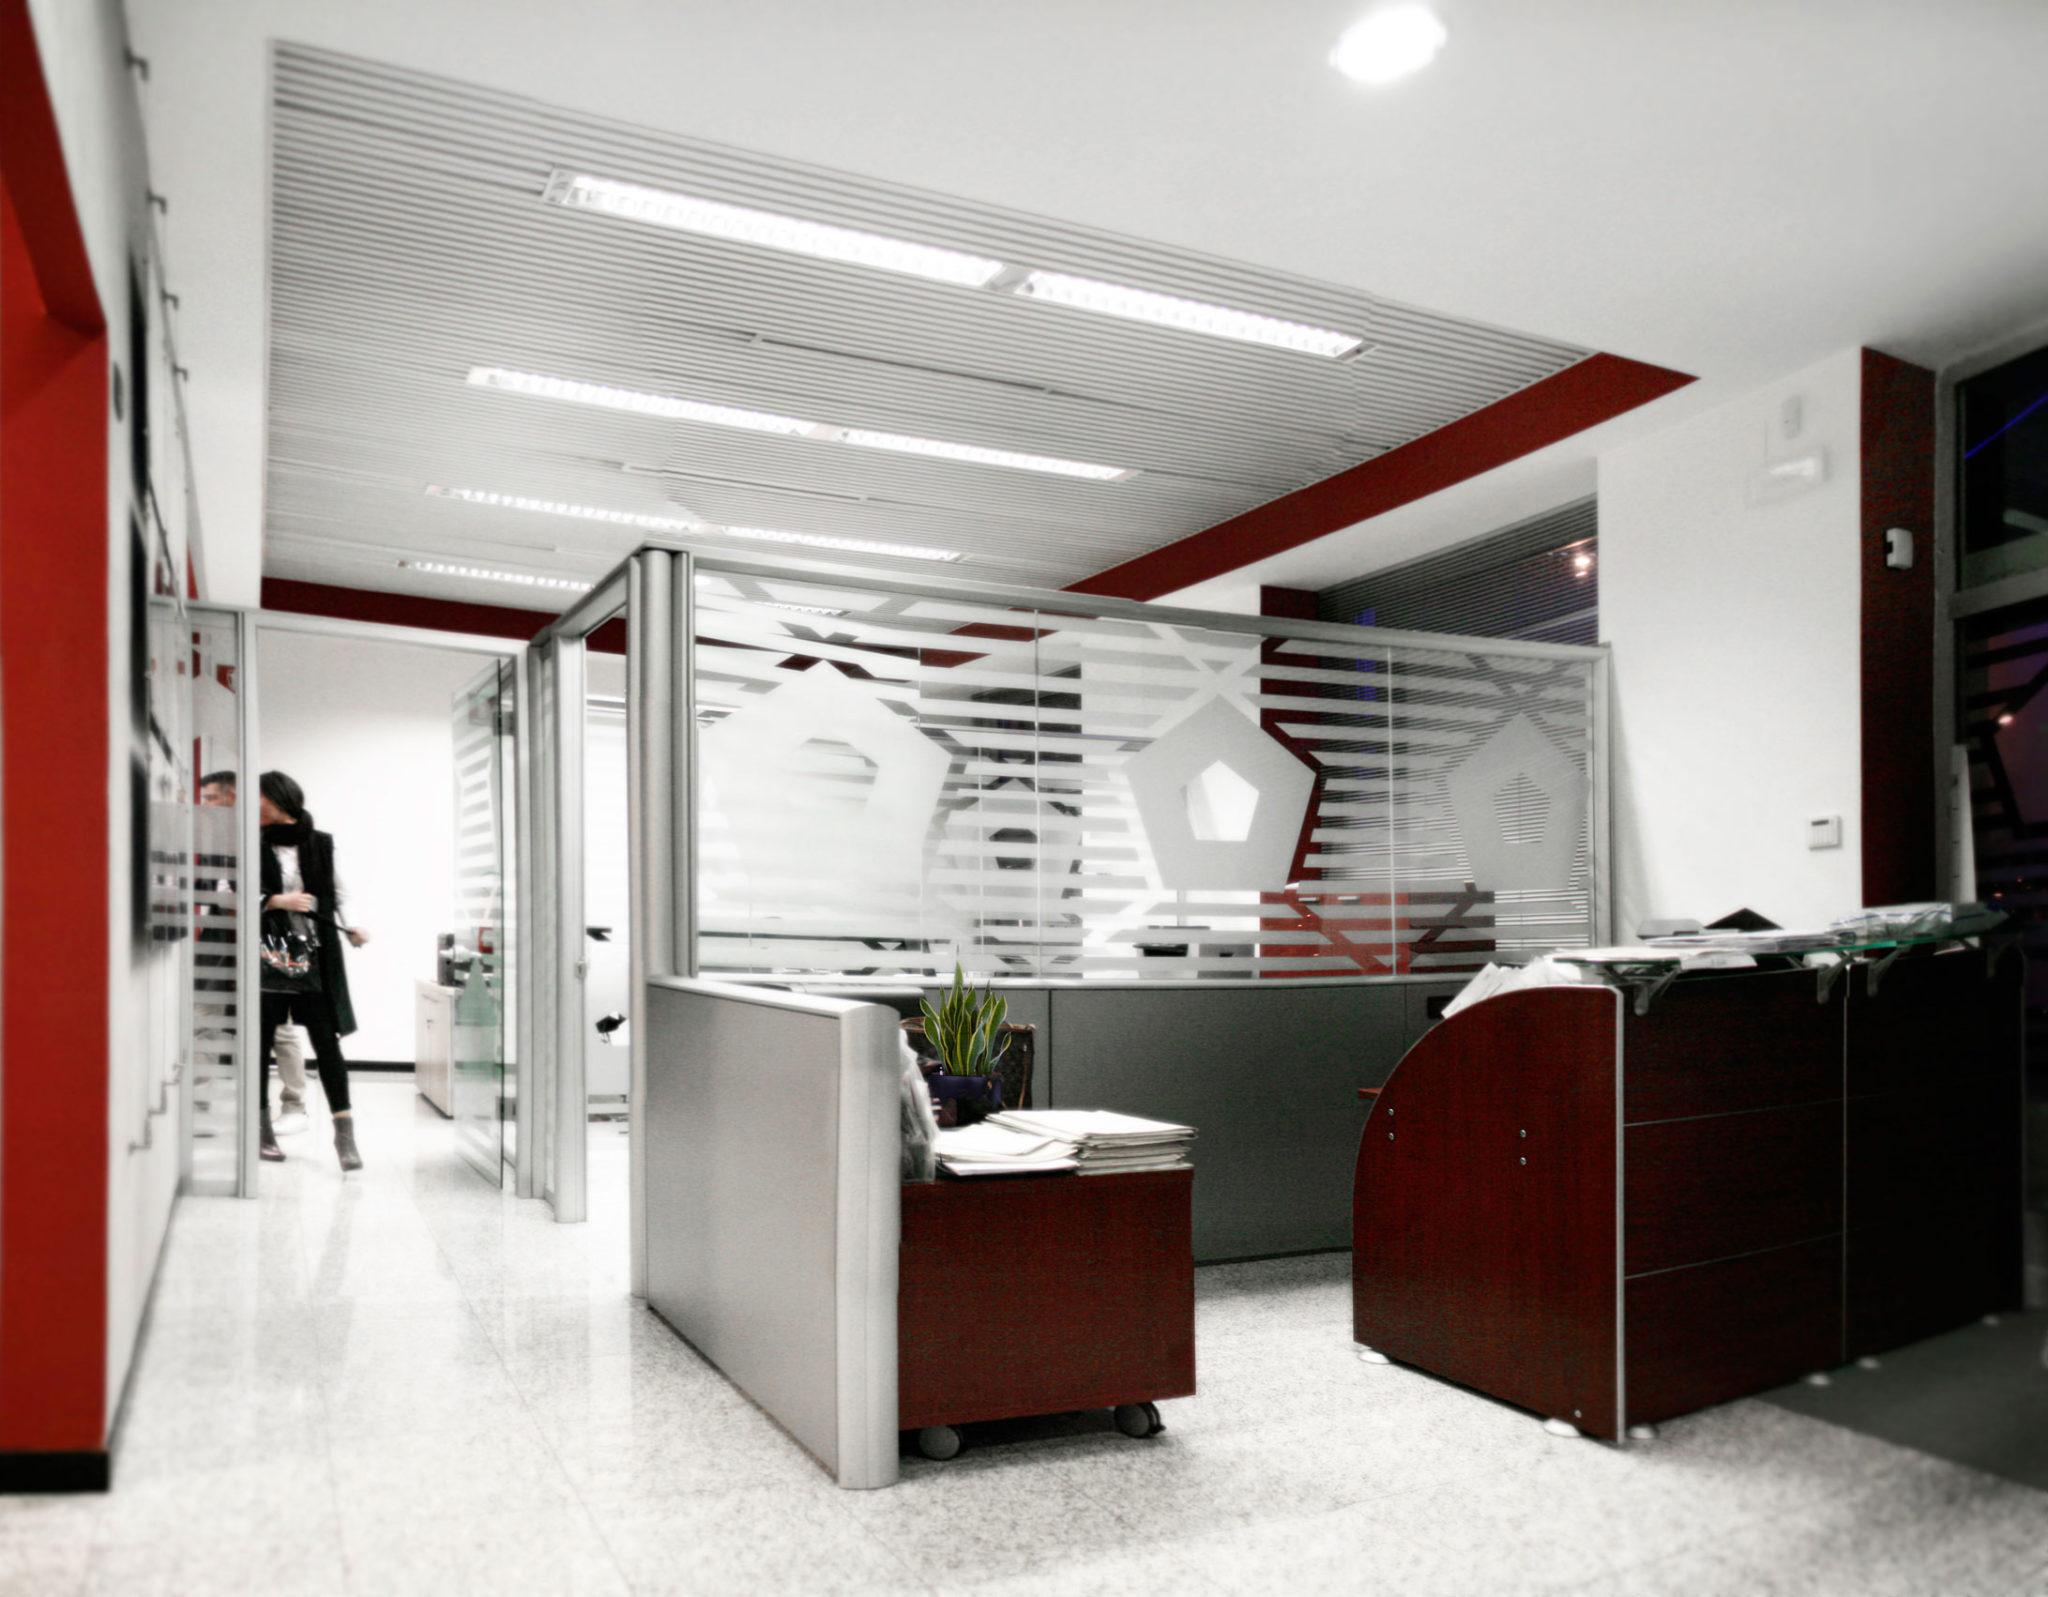 PENTA OFFICE, ROME